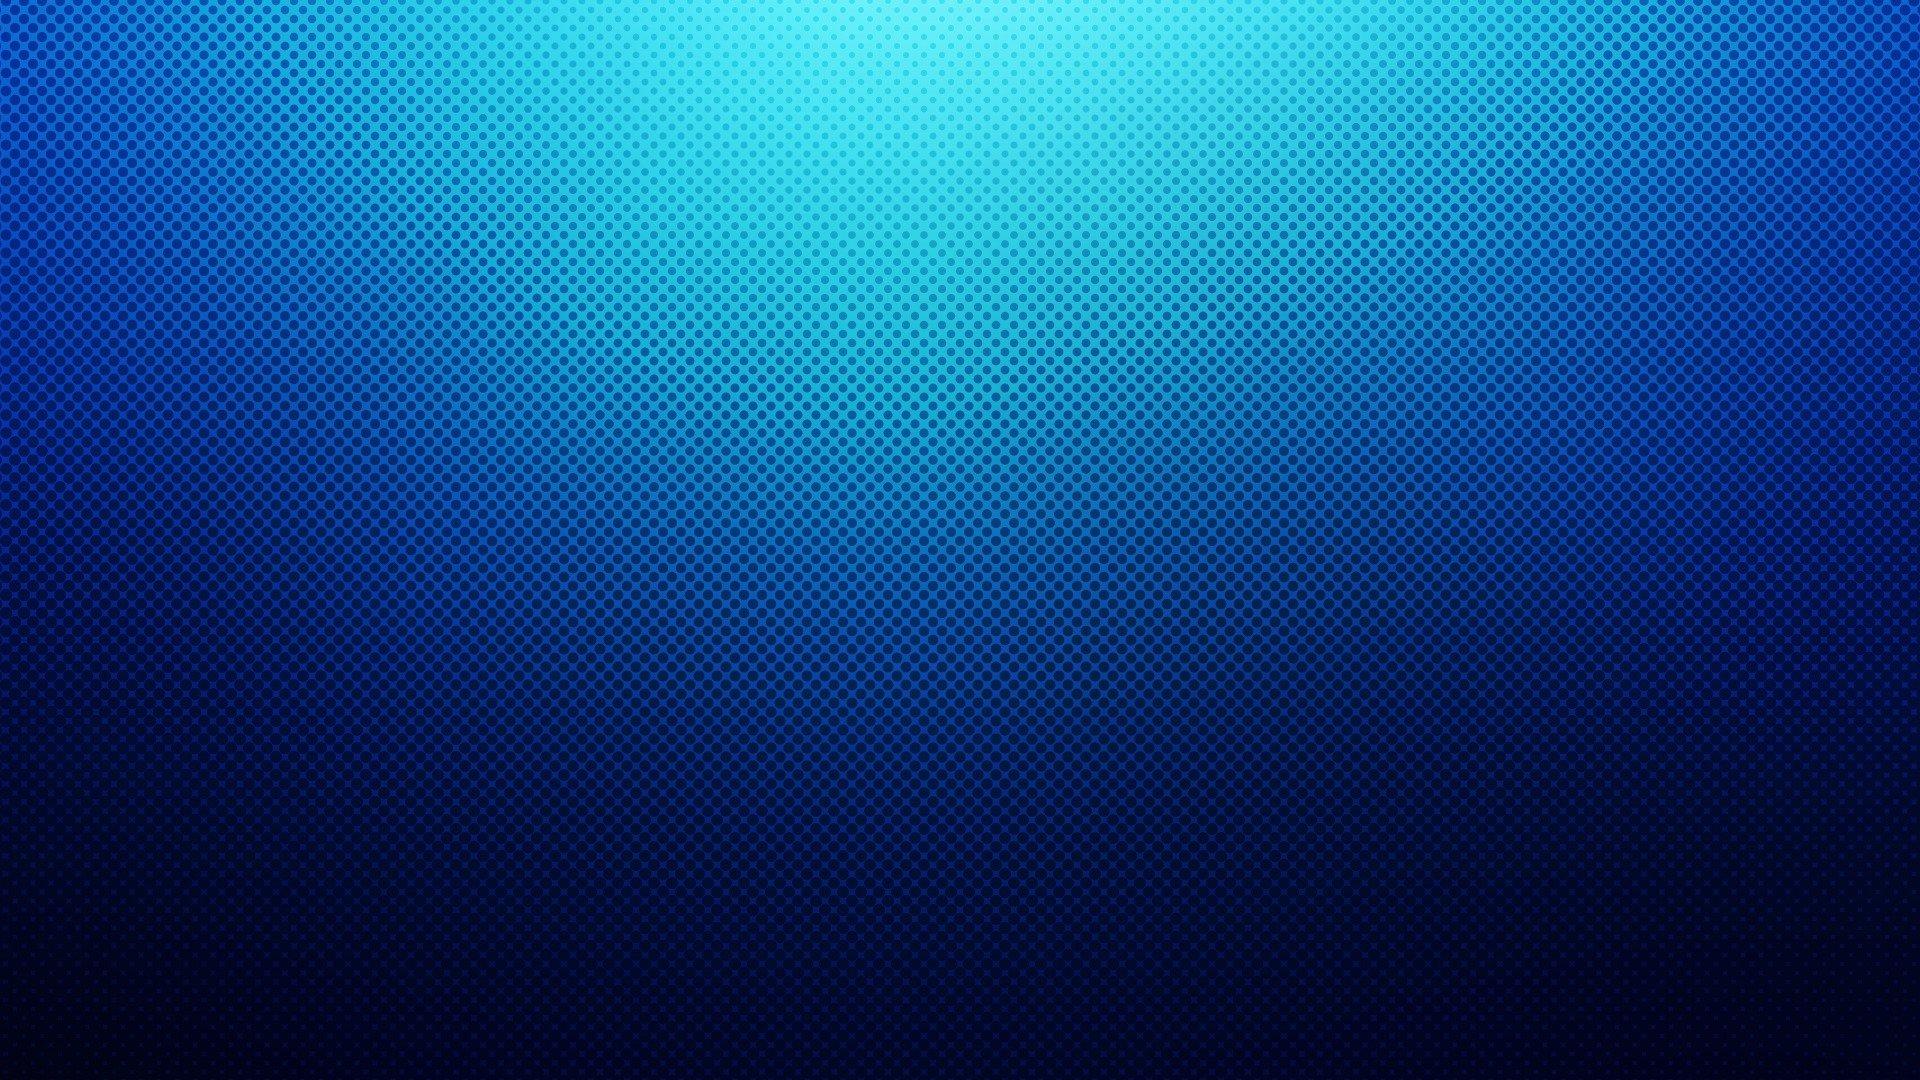 blue pattern wallpaper | Kjpwg com